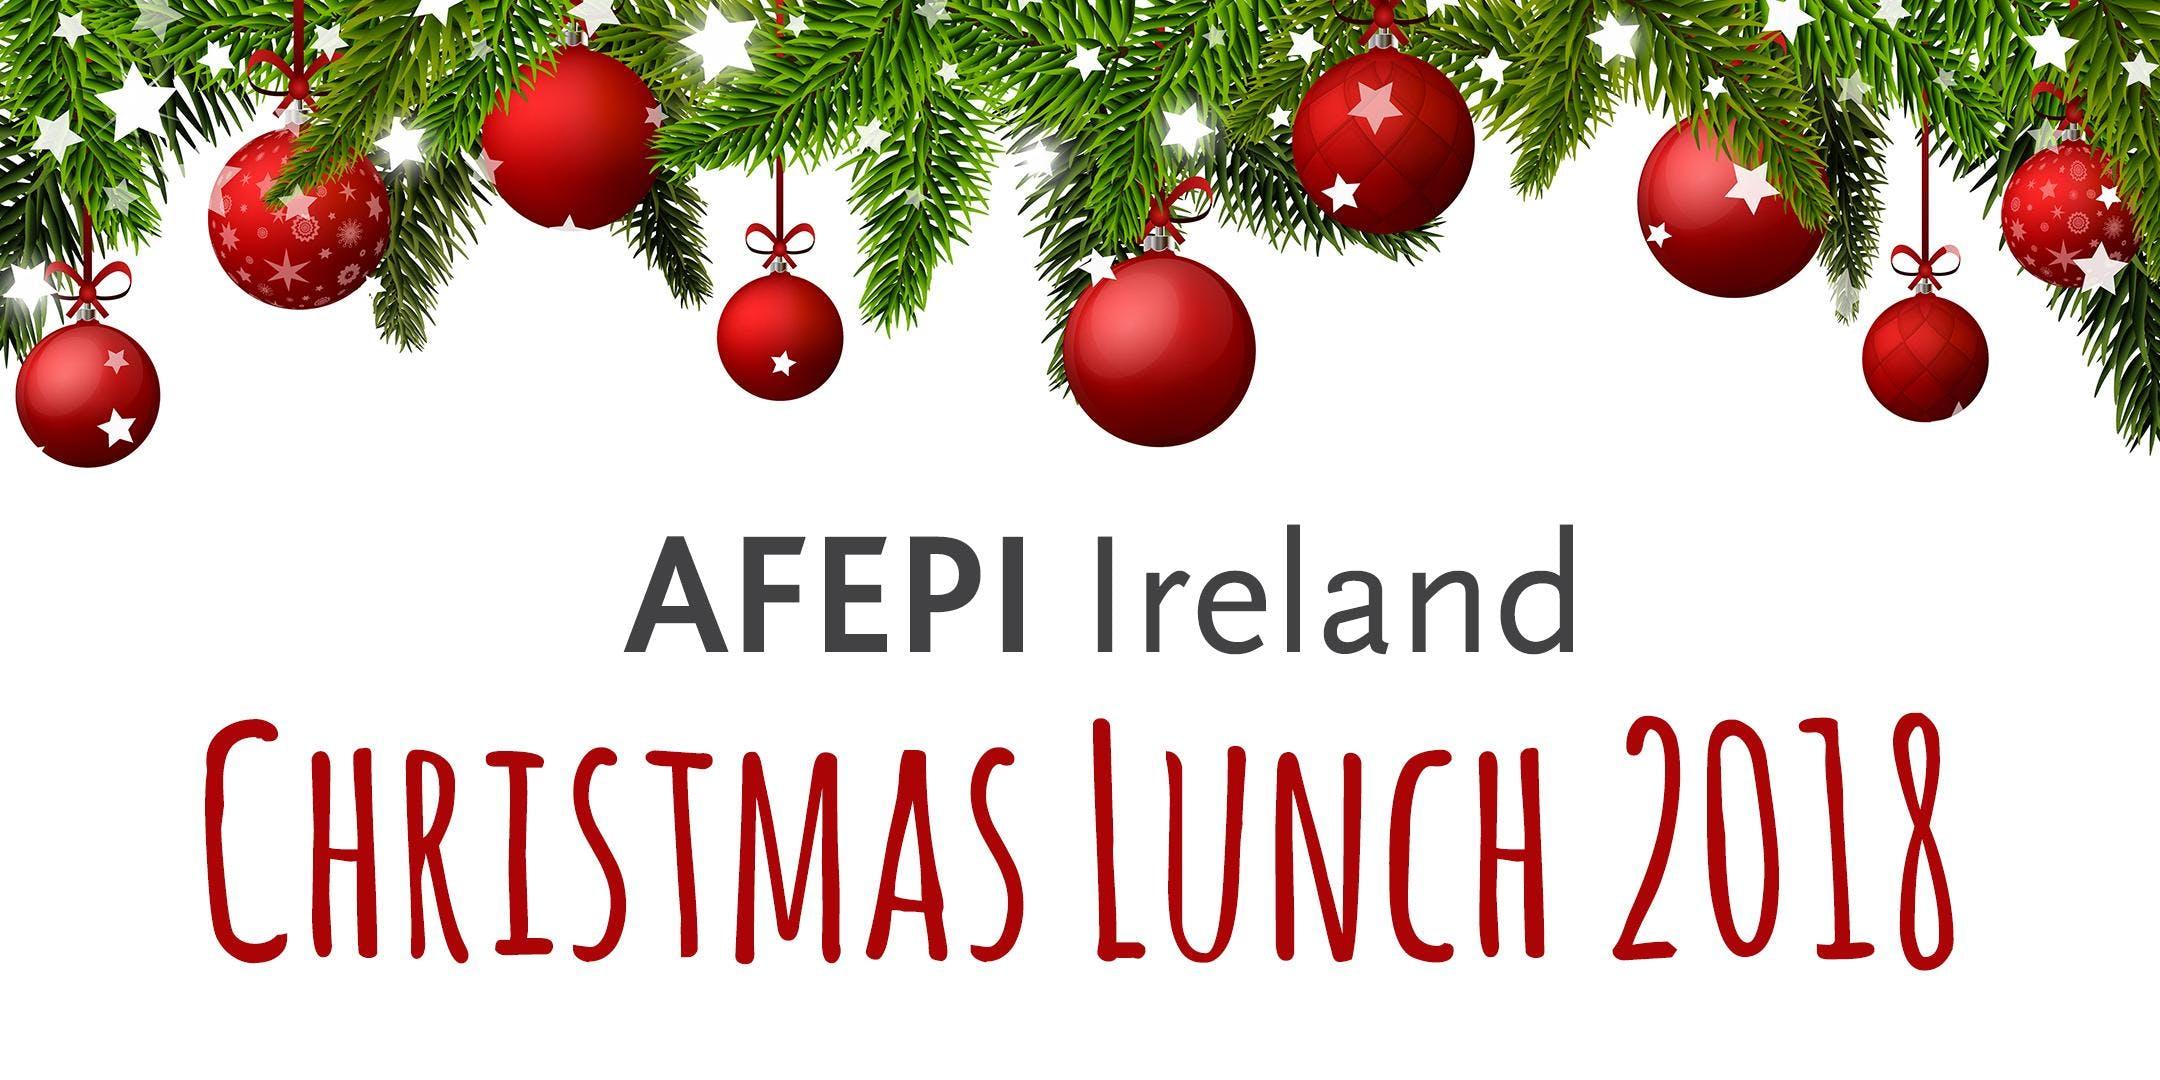 AFEPI Ireland Christmas Lunch 2018 - 8 DEZ 18